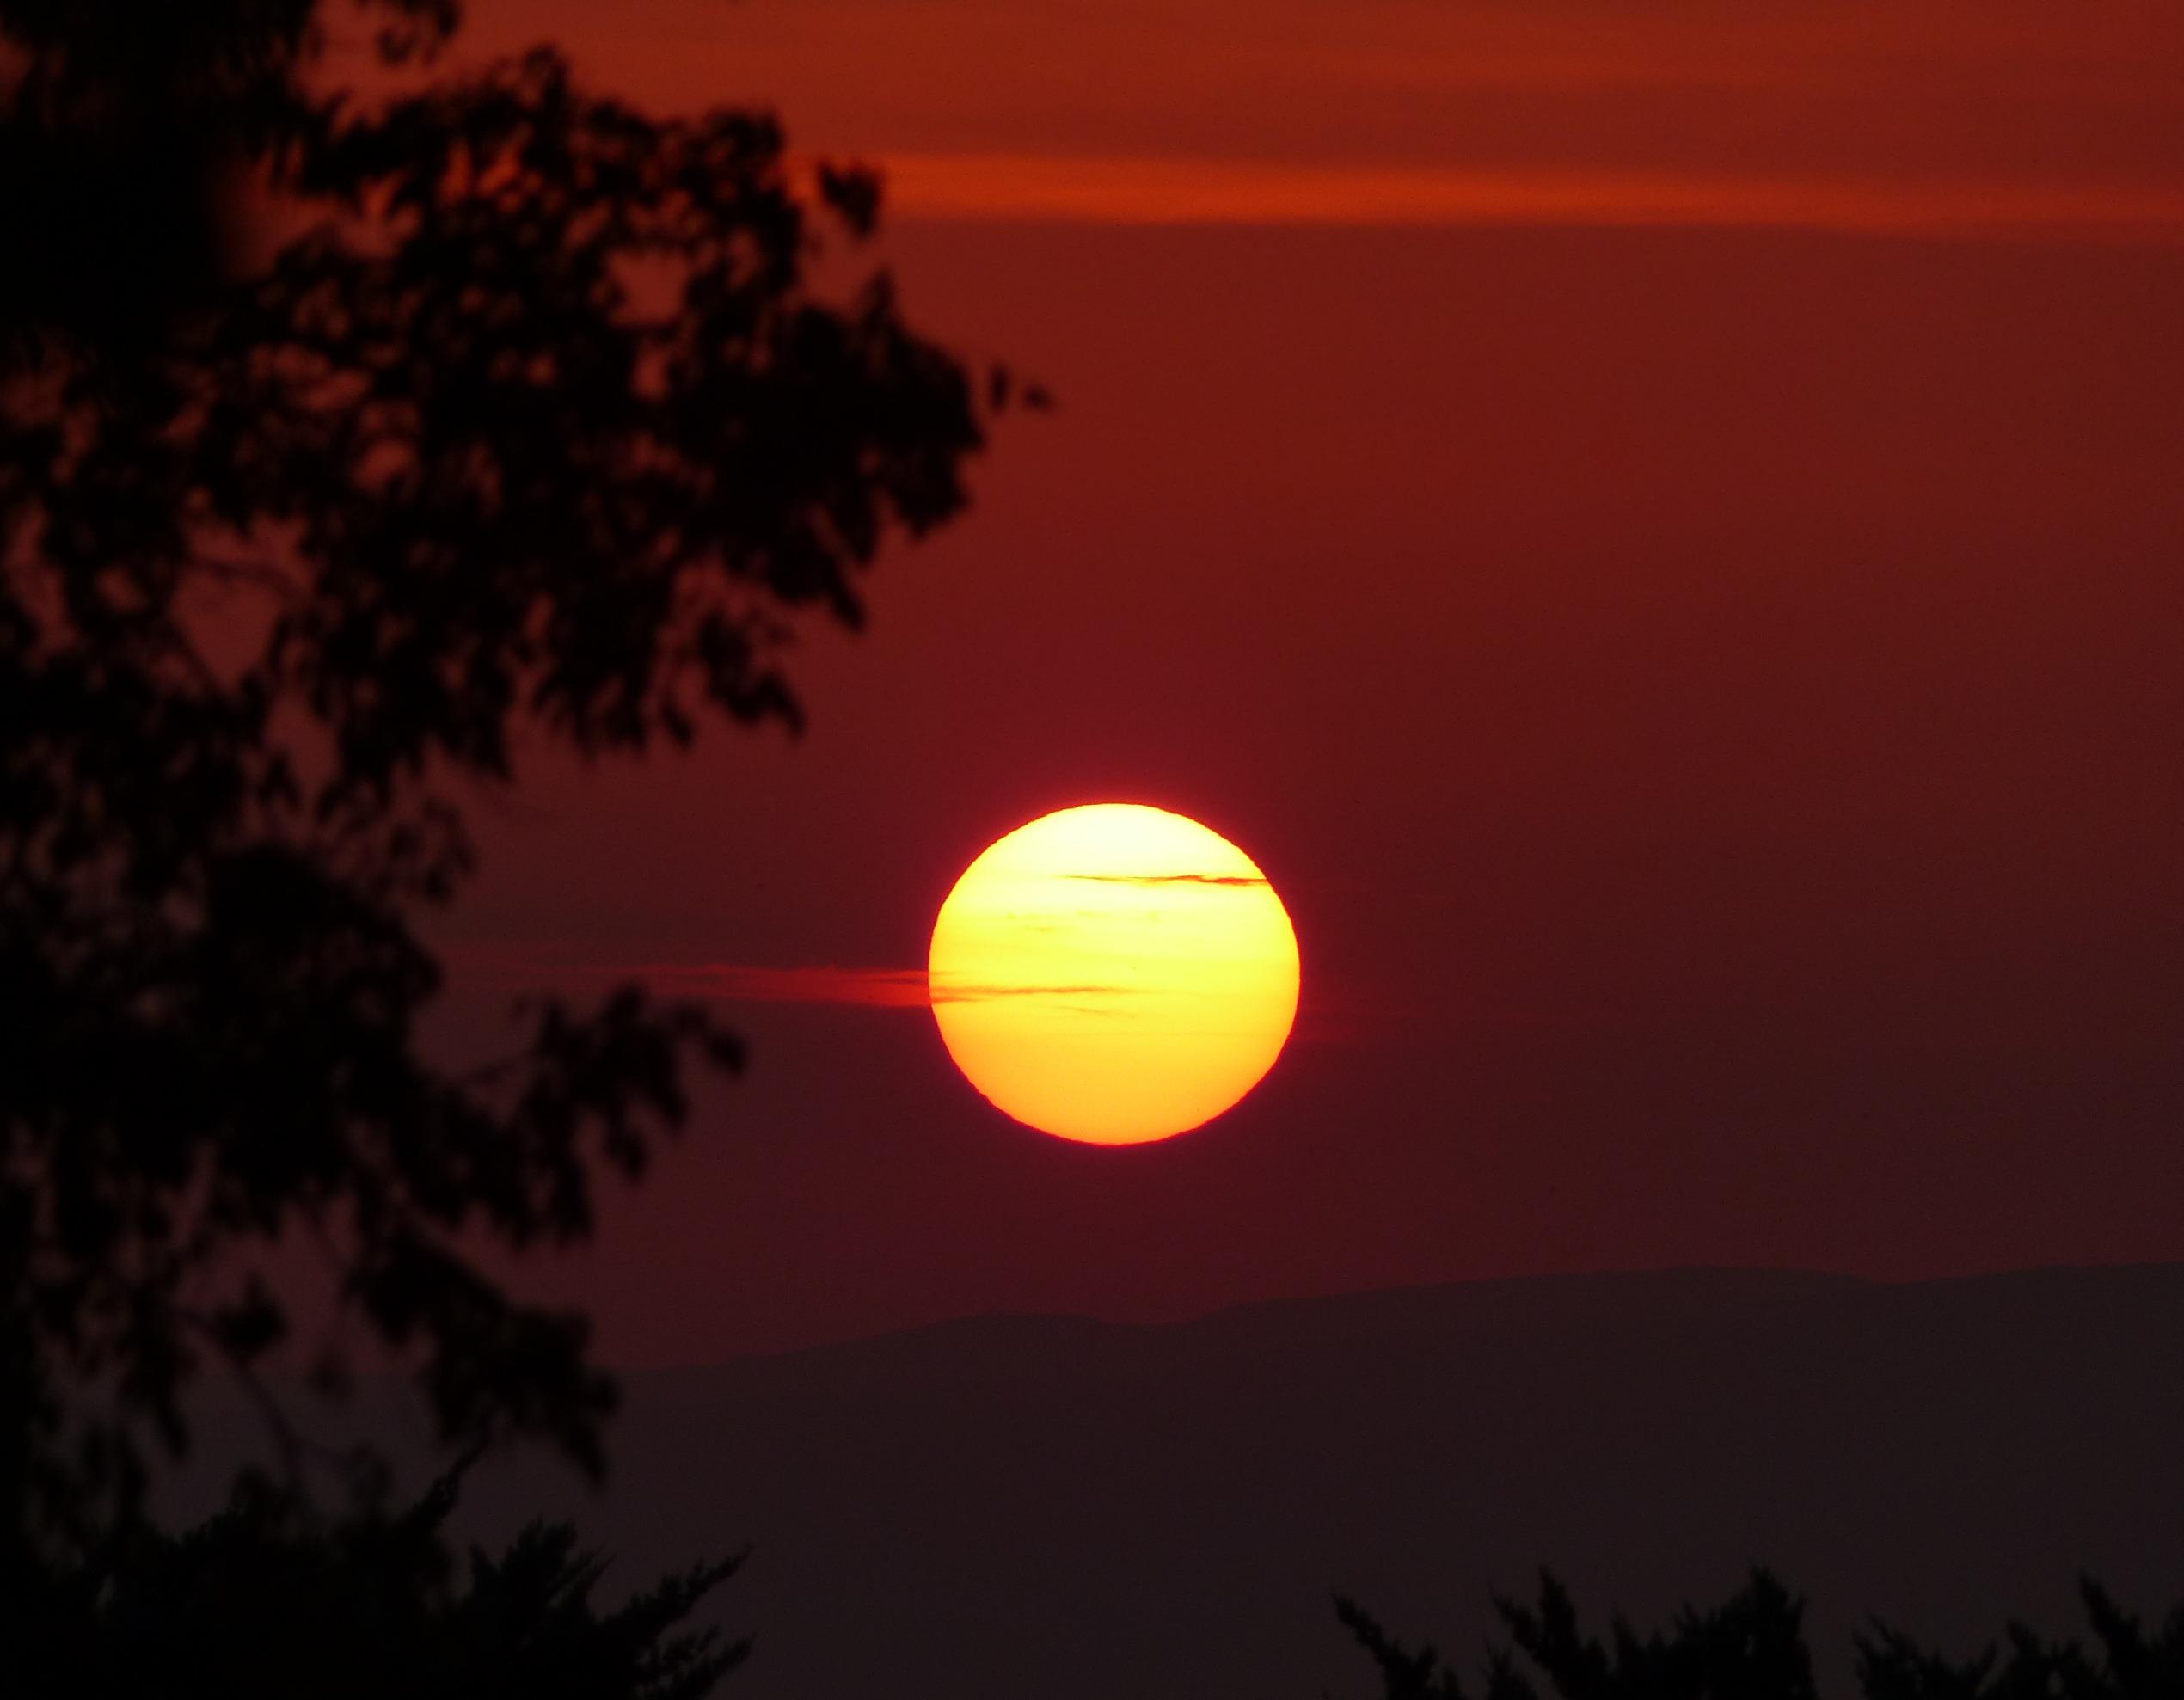 http://ekladata.com/CzHJ-m-iBboXQCO1f7VHlzI2Jt0/saint-jurs-coucher-de-soleil.jpg